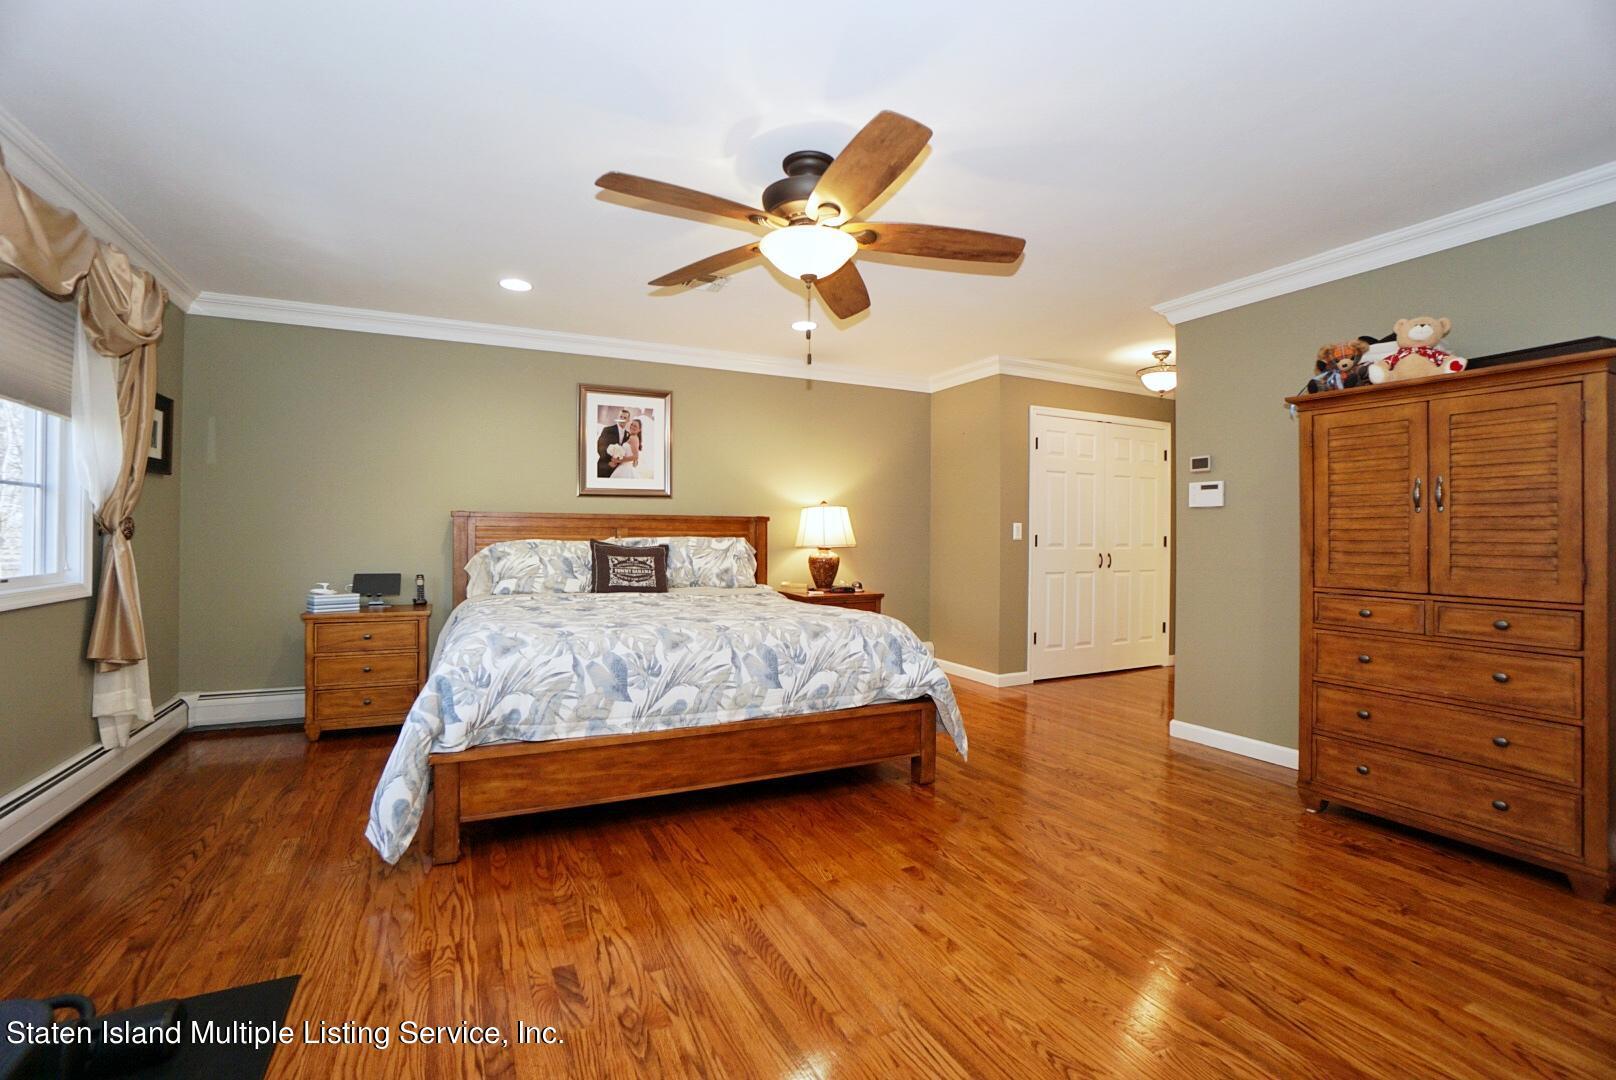 Single Family - Detached 31 Belwood Loop  Staten Island, NY 10307, MLS-1143133-31